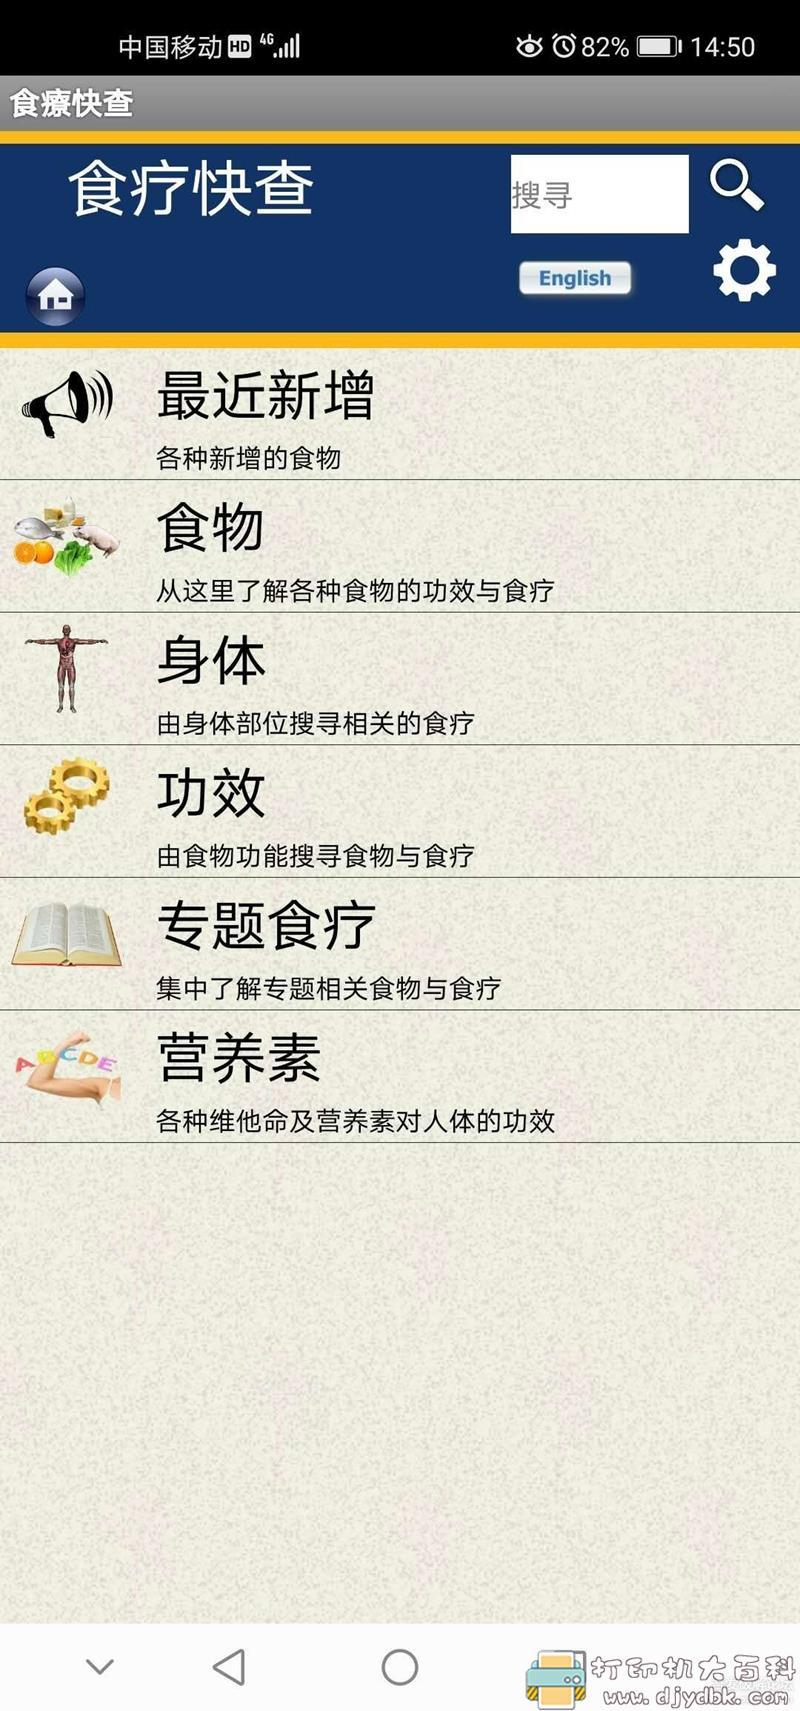 [Android]养生系列【食疗快查app】了解你吃的食物的特性图片 No.1